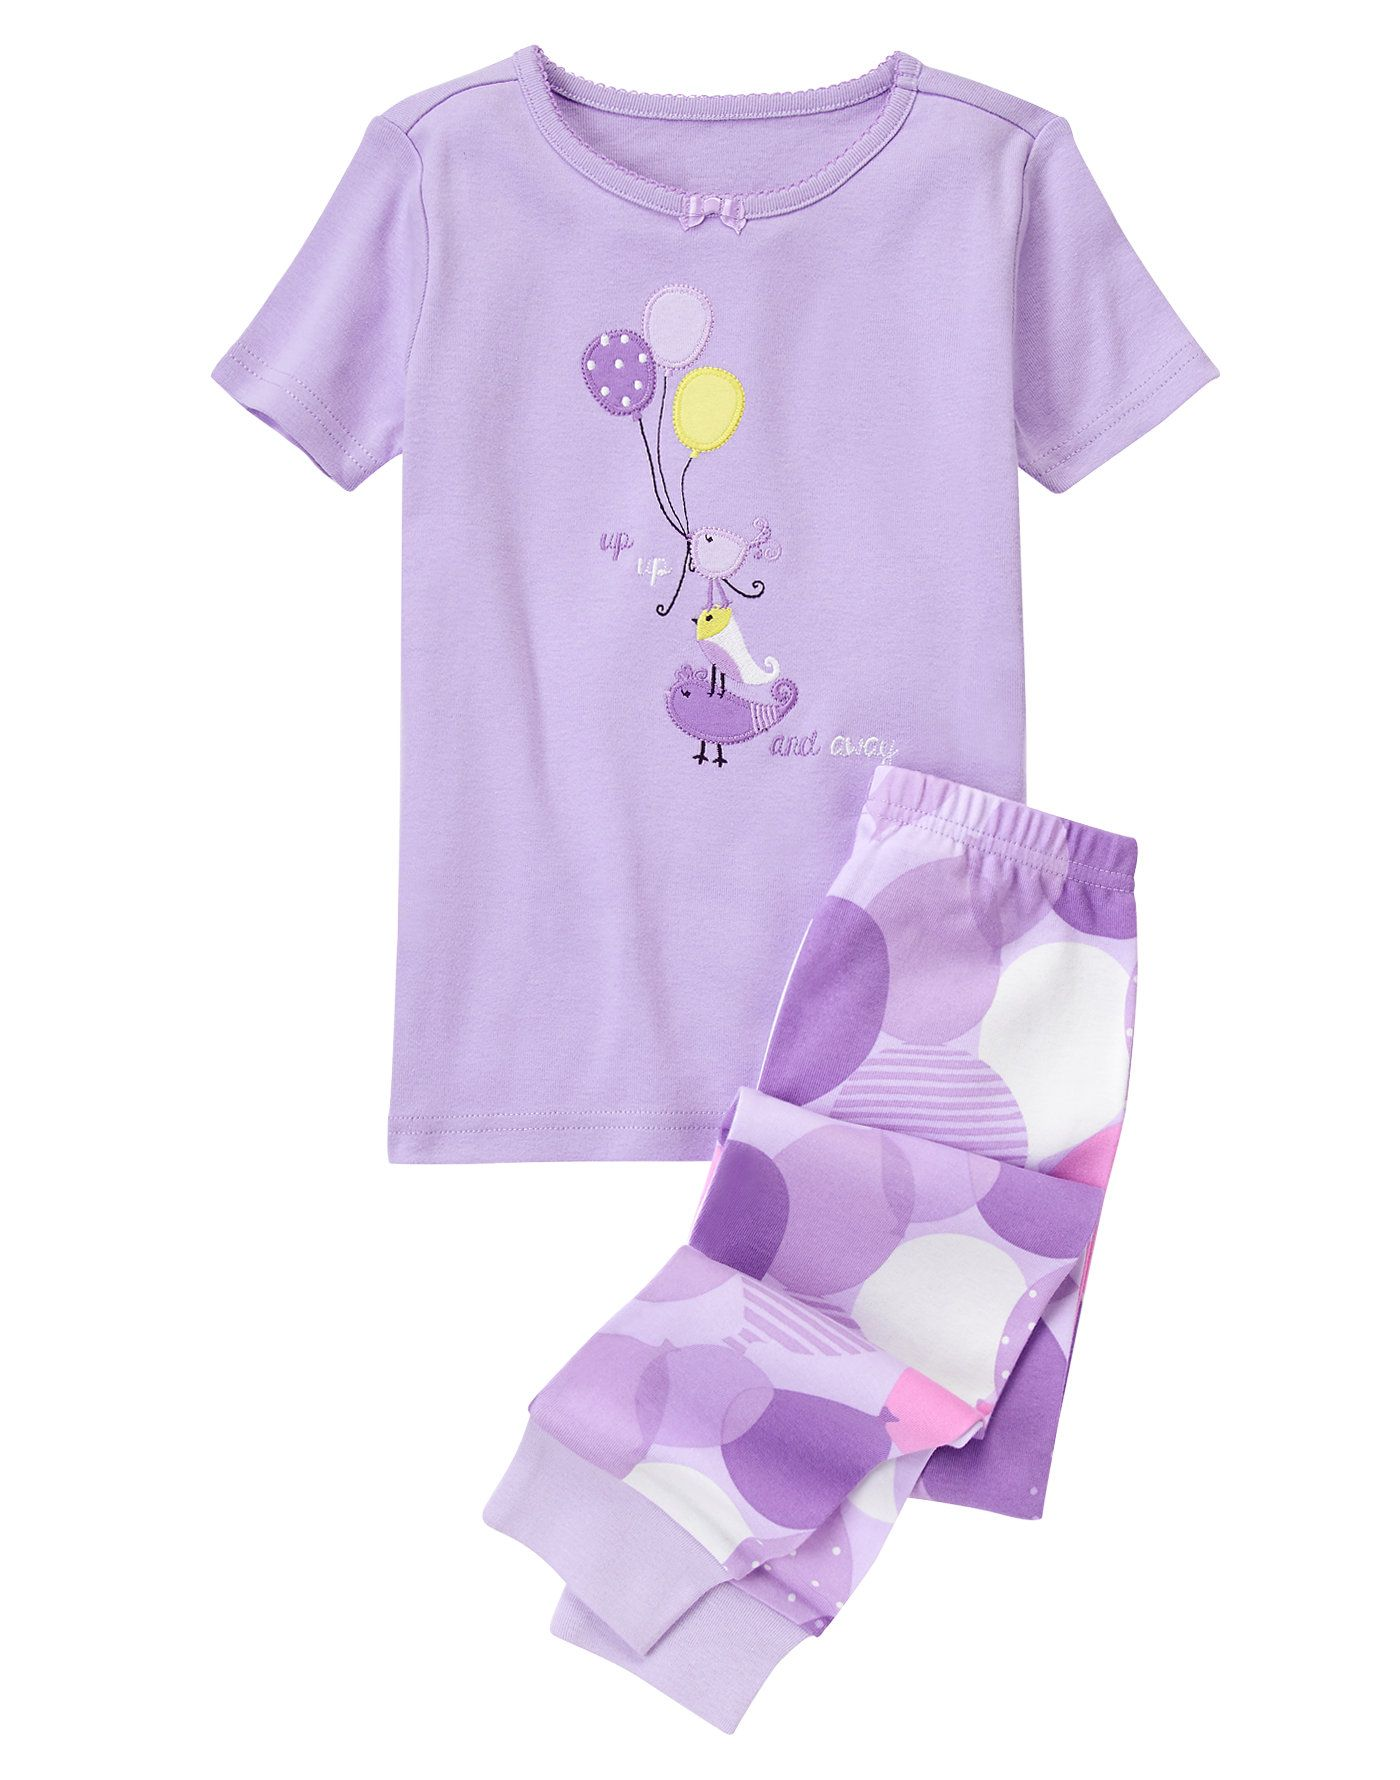 NWT Gymboree Girls Gymmies Pajamas U Pick Pjs Sleepware sz 3 4 5 6 7 8 10 12 new